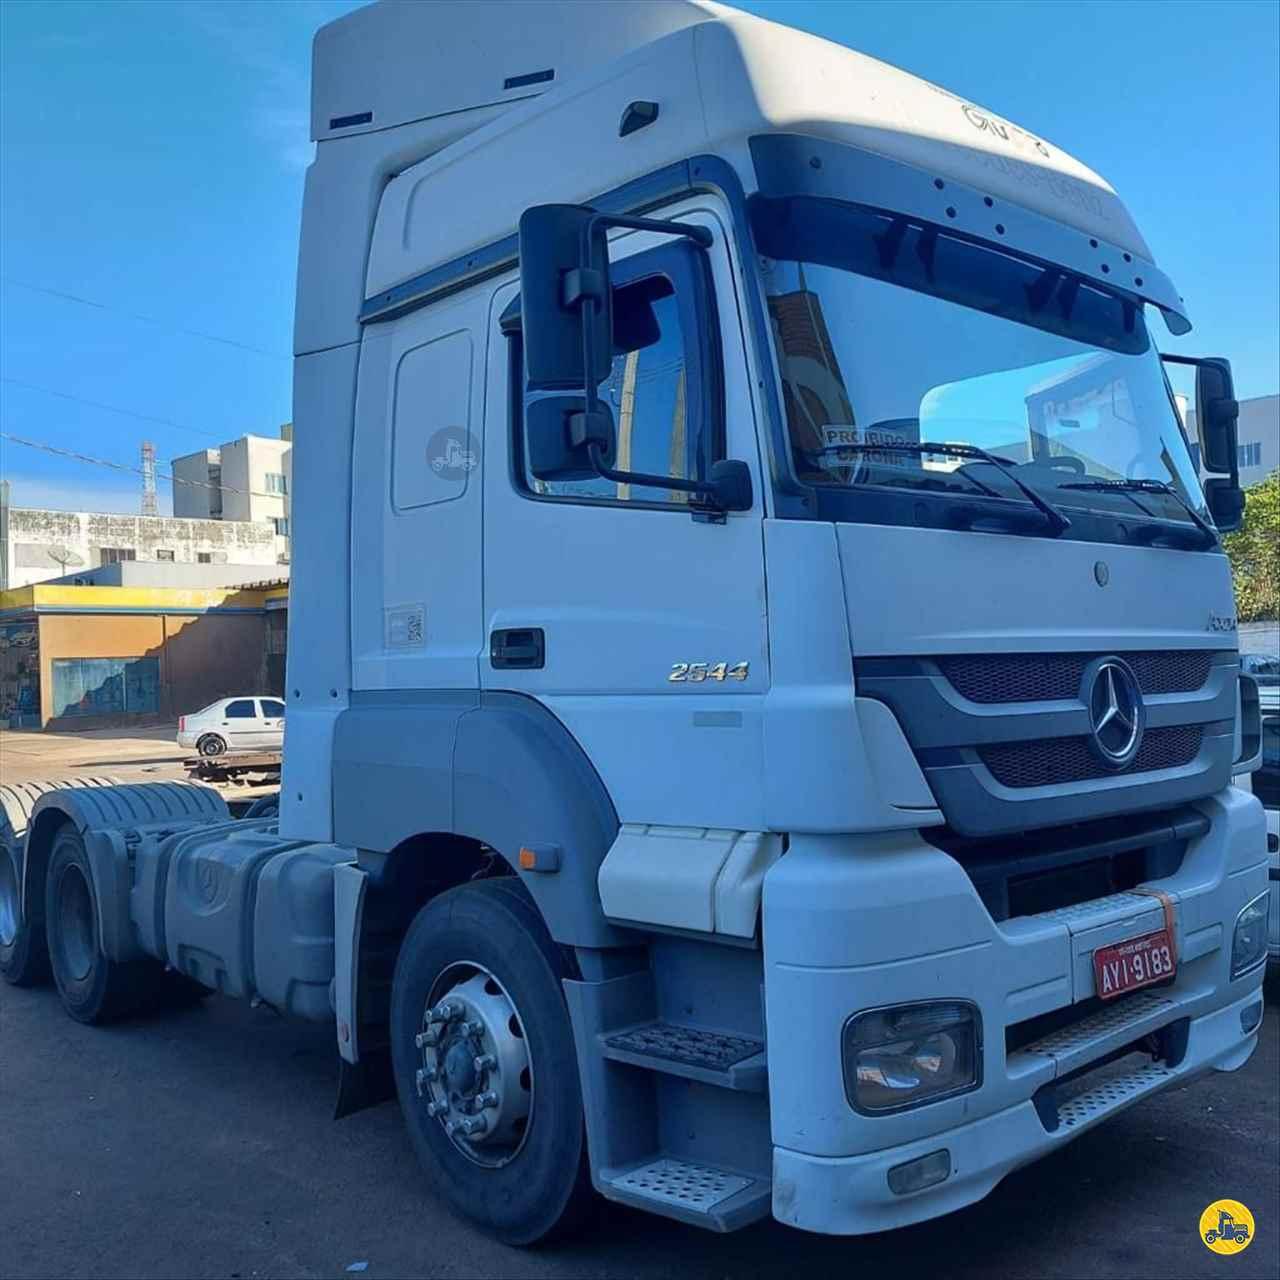 CAMINHAO MERCEDES-BENZ MB 2544 Cavalo Mecânico Truck 6x2 Freccia Caminhões JAGUARUNA SANTA CATARINA SC